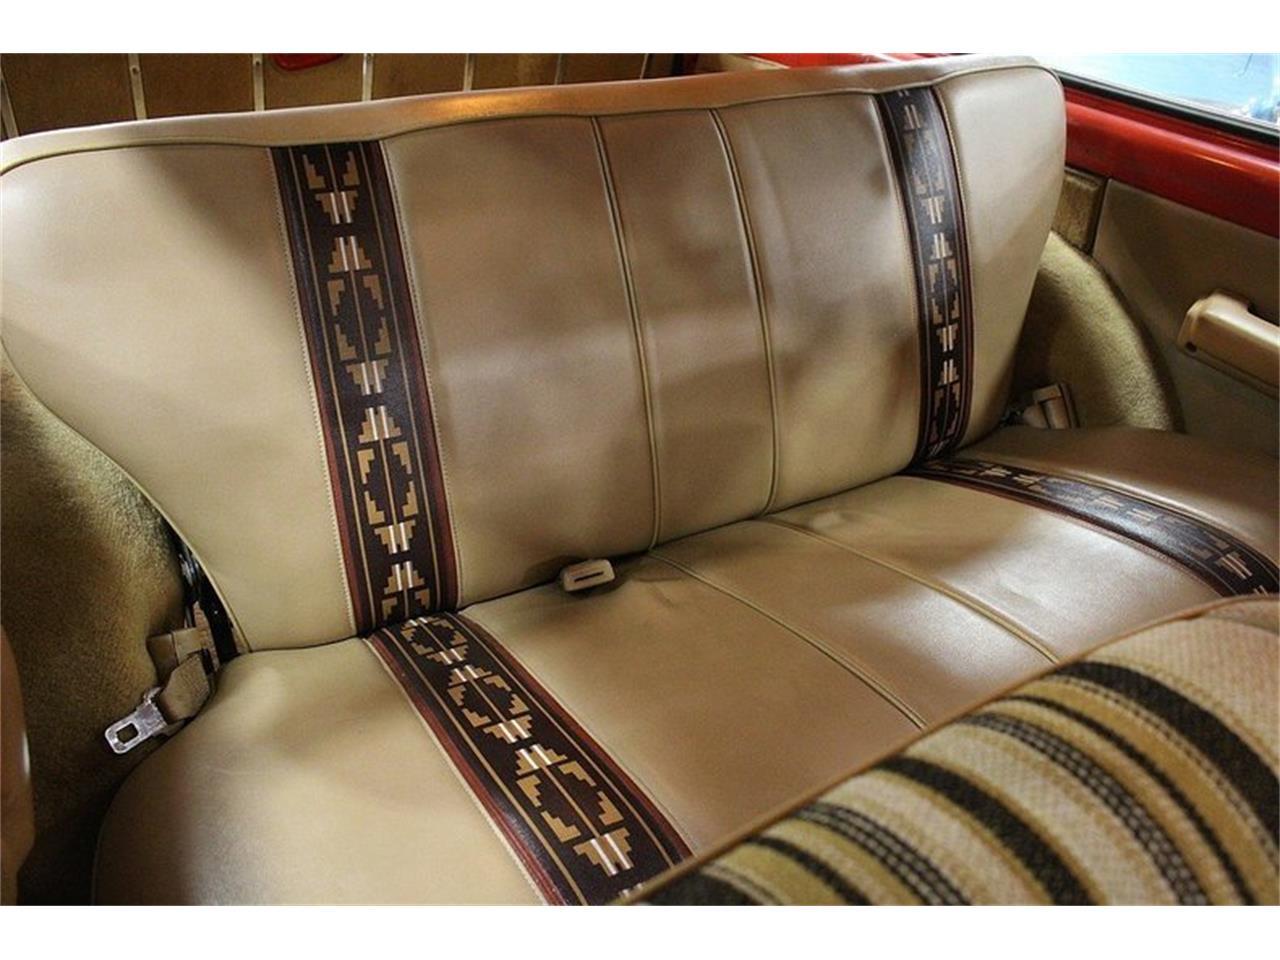 jeep cherokee chief for sale michigan